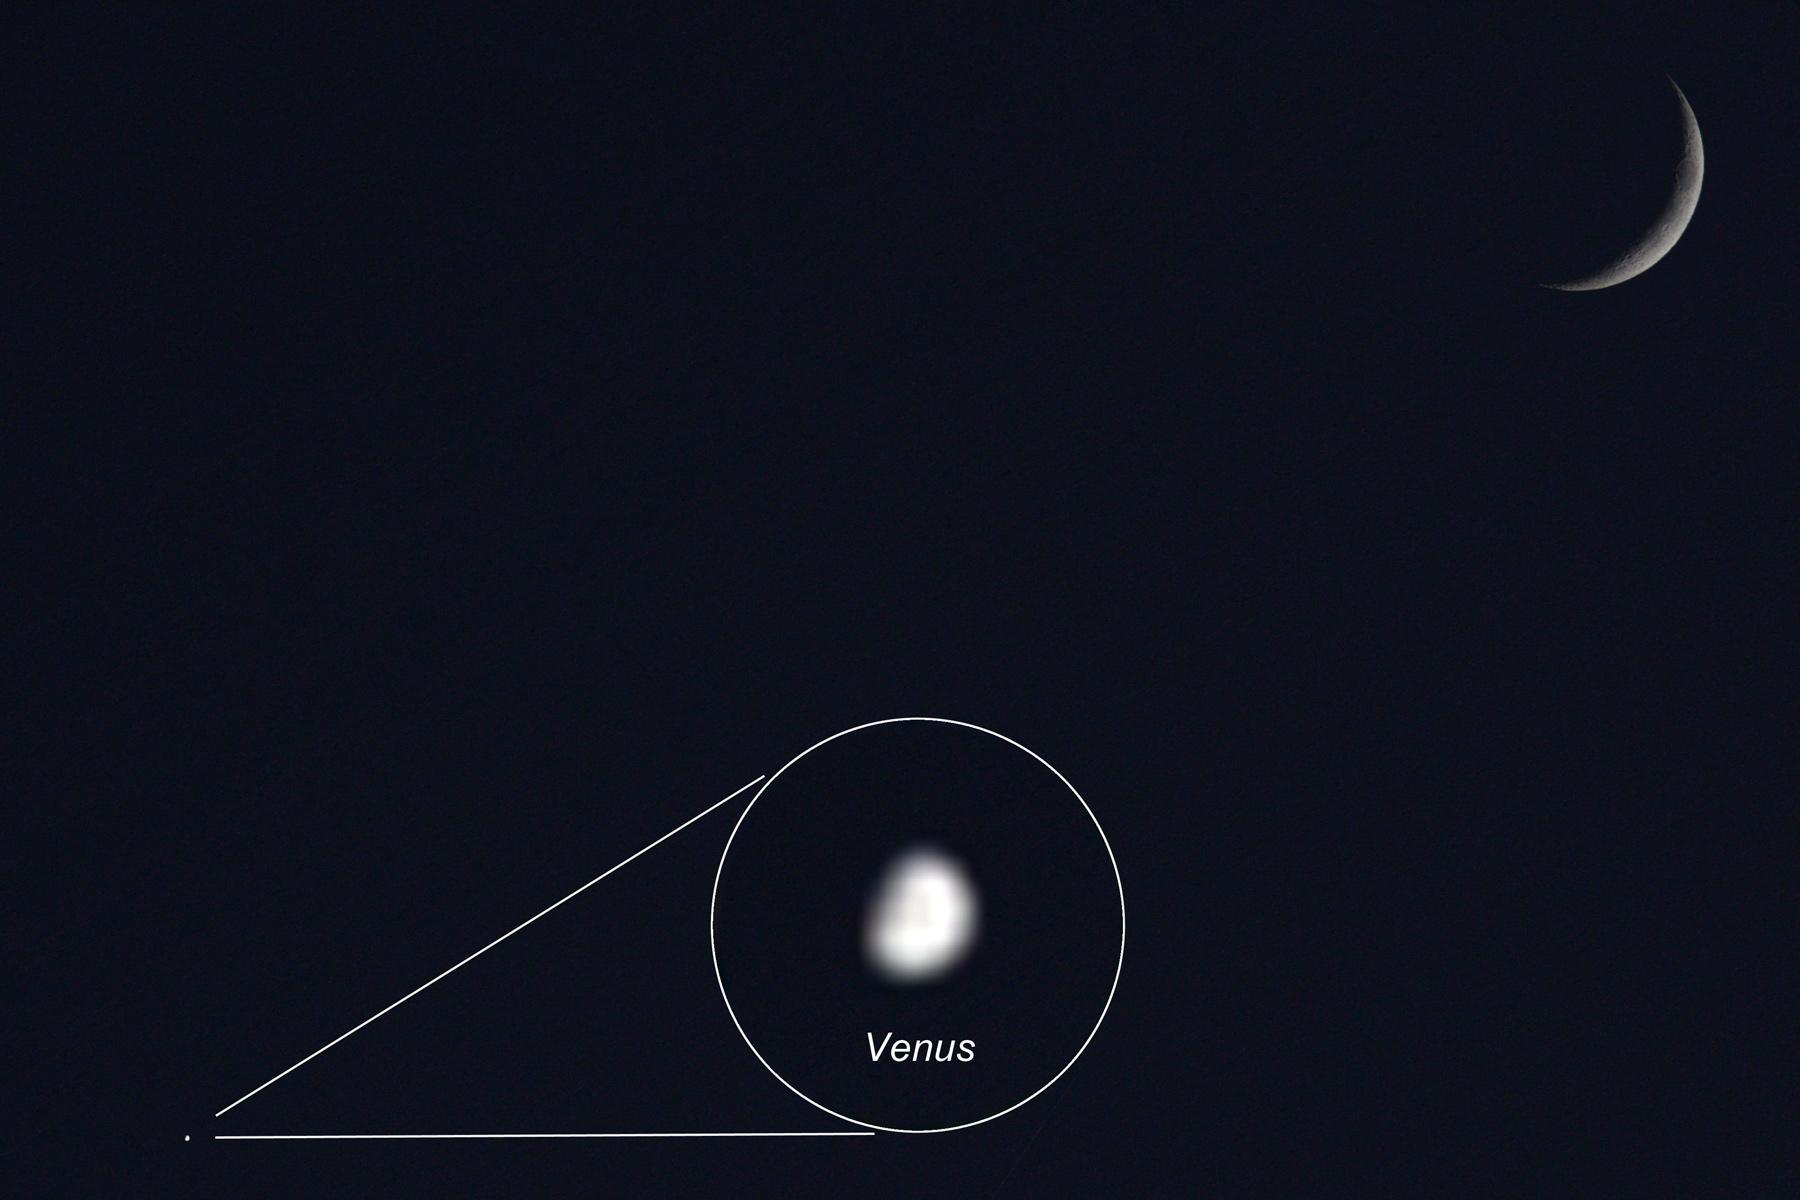 venus and its moons - photo #20